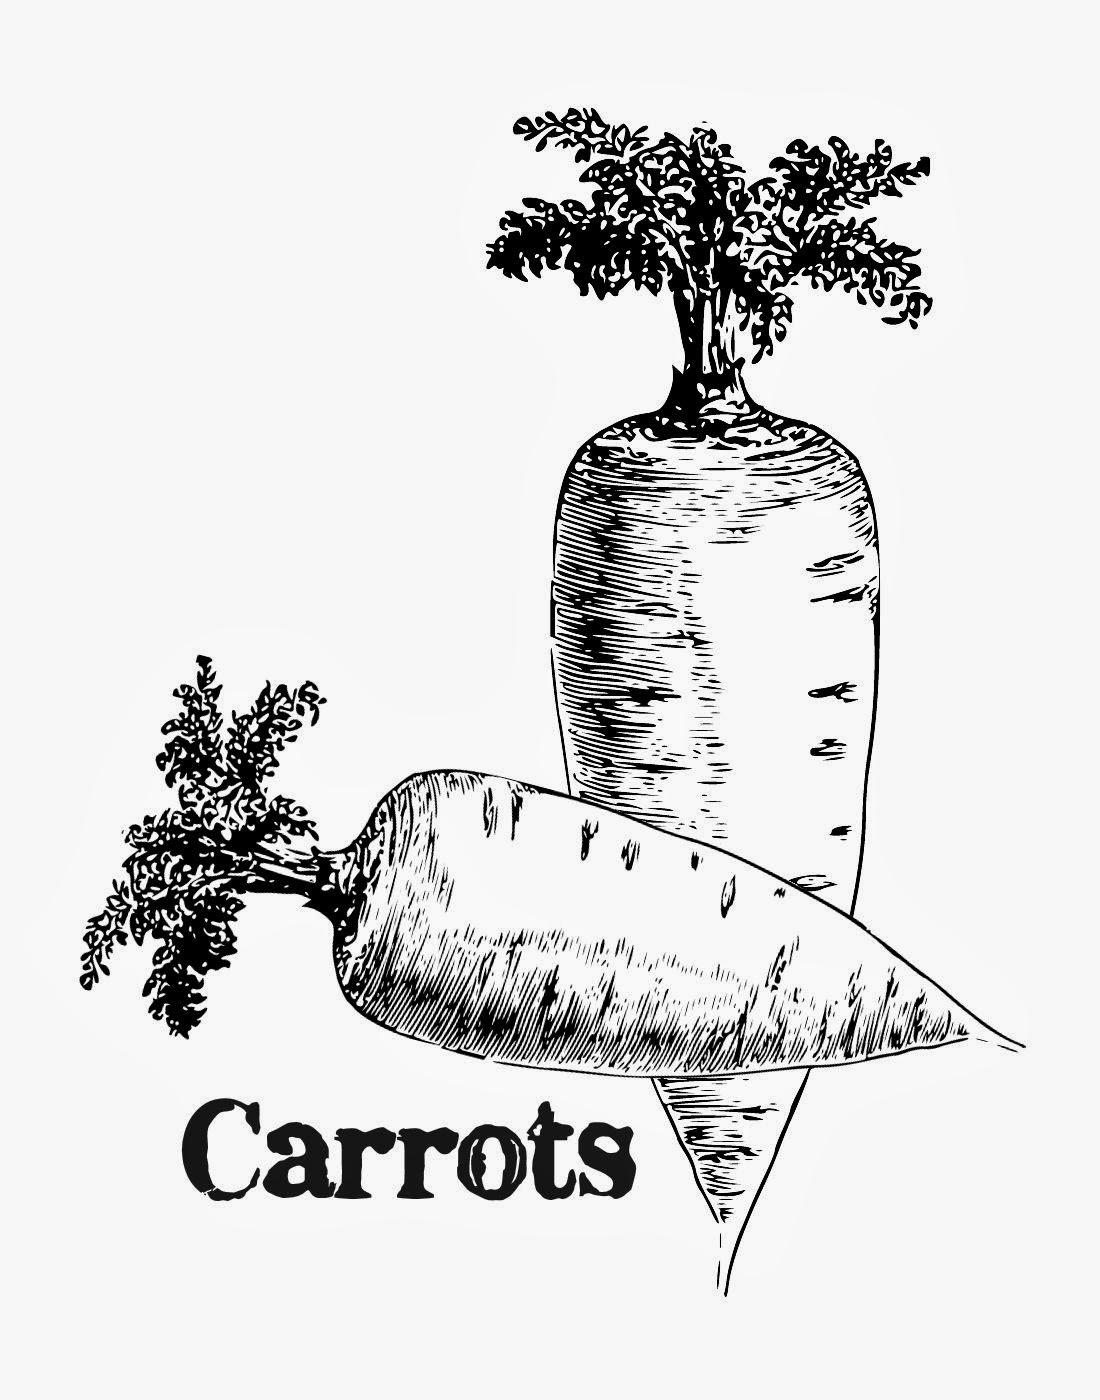 http://4.bp.blogspot.com/-6M62D8TlHl8/Uy76c82C3UI/AAAAAAAA0fs/pV0QXwLohH4/s1600/CarrotsVintageSeedAdTlcCreations.jpg